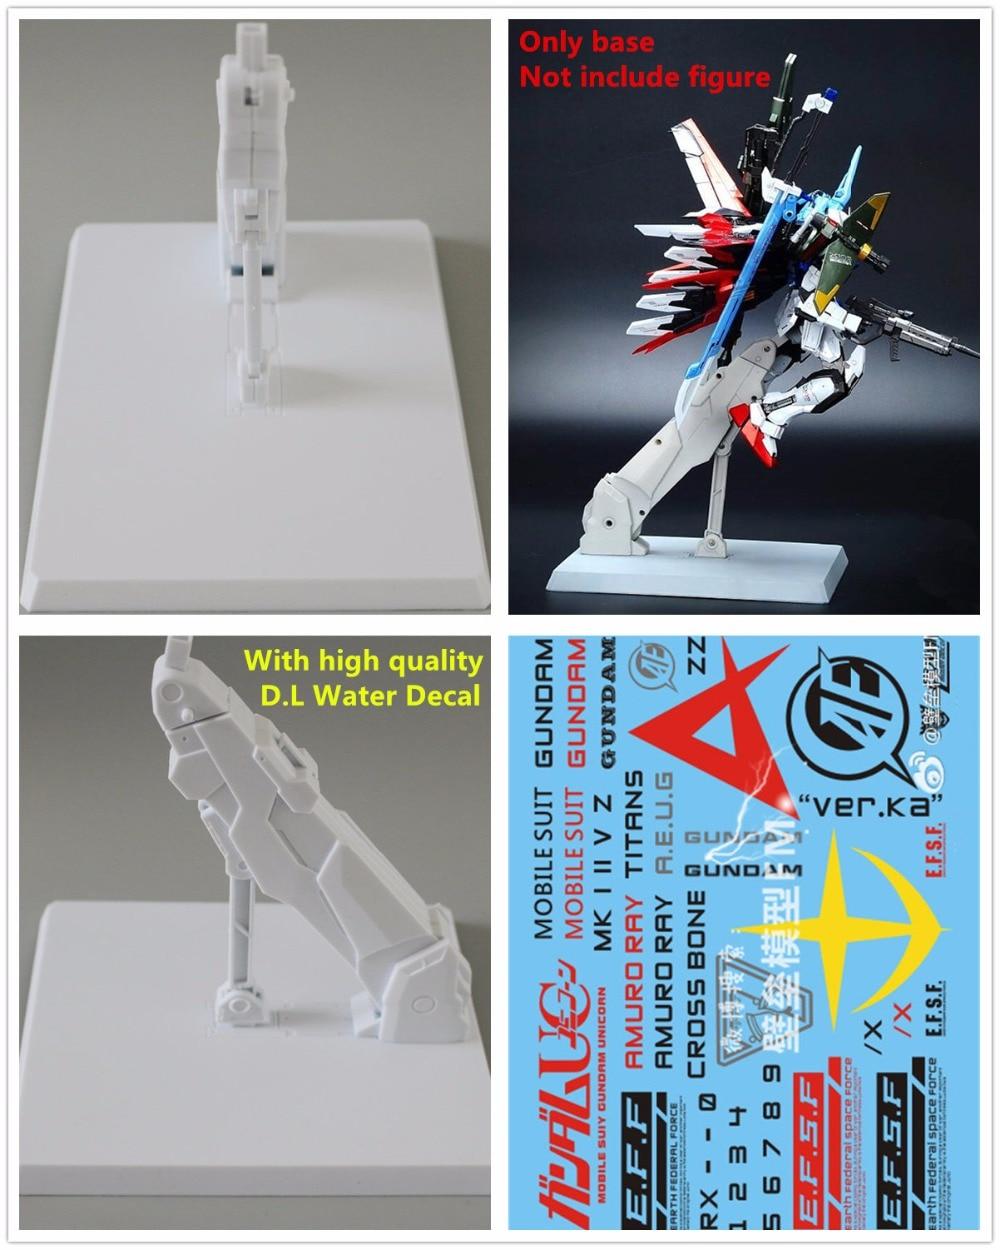 Modelo de fortaleza e. f. s. f base para mb mg bandai 1/100 titãs mk zz gundam unicorn db014